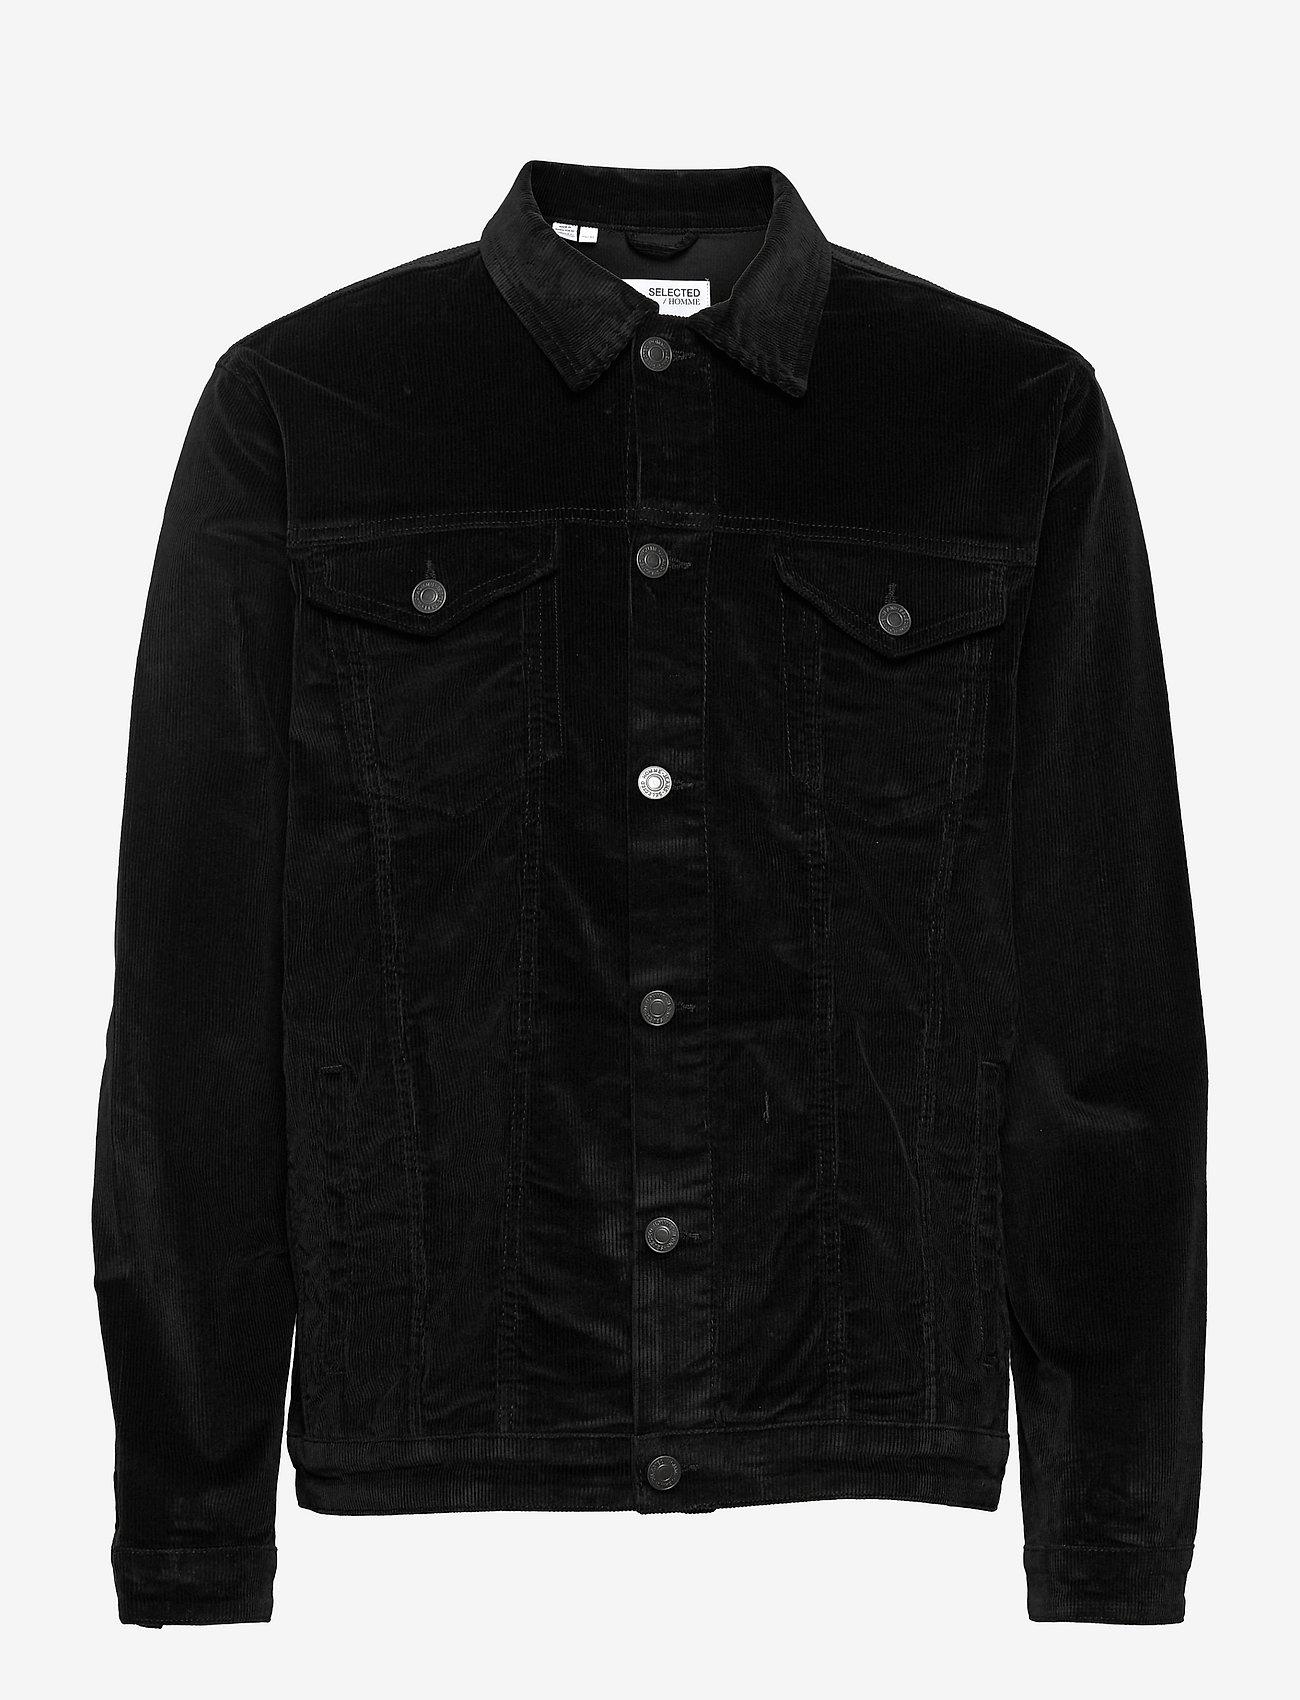 Selected Homme - SLHJEPPE CORDUROY JACKET M - spijkerjassen - black - 0